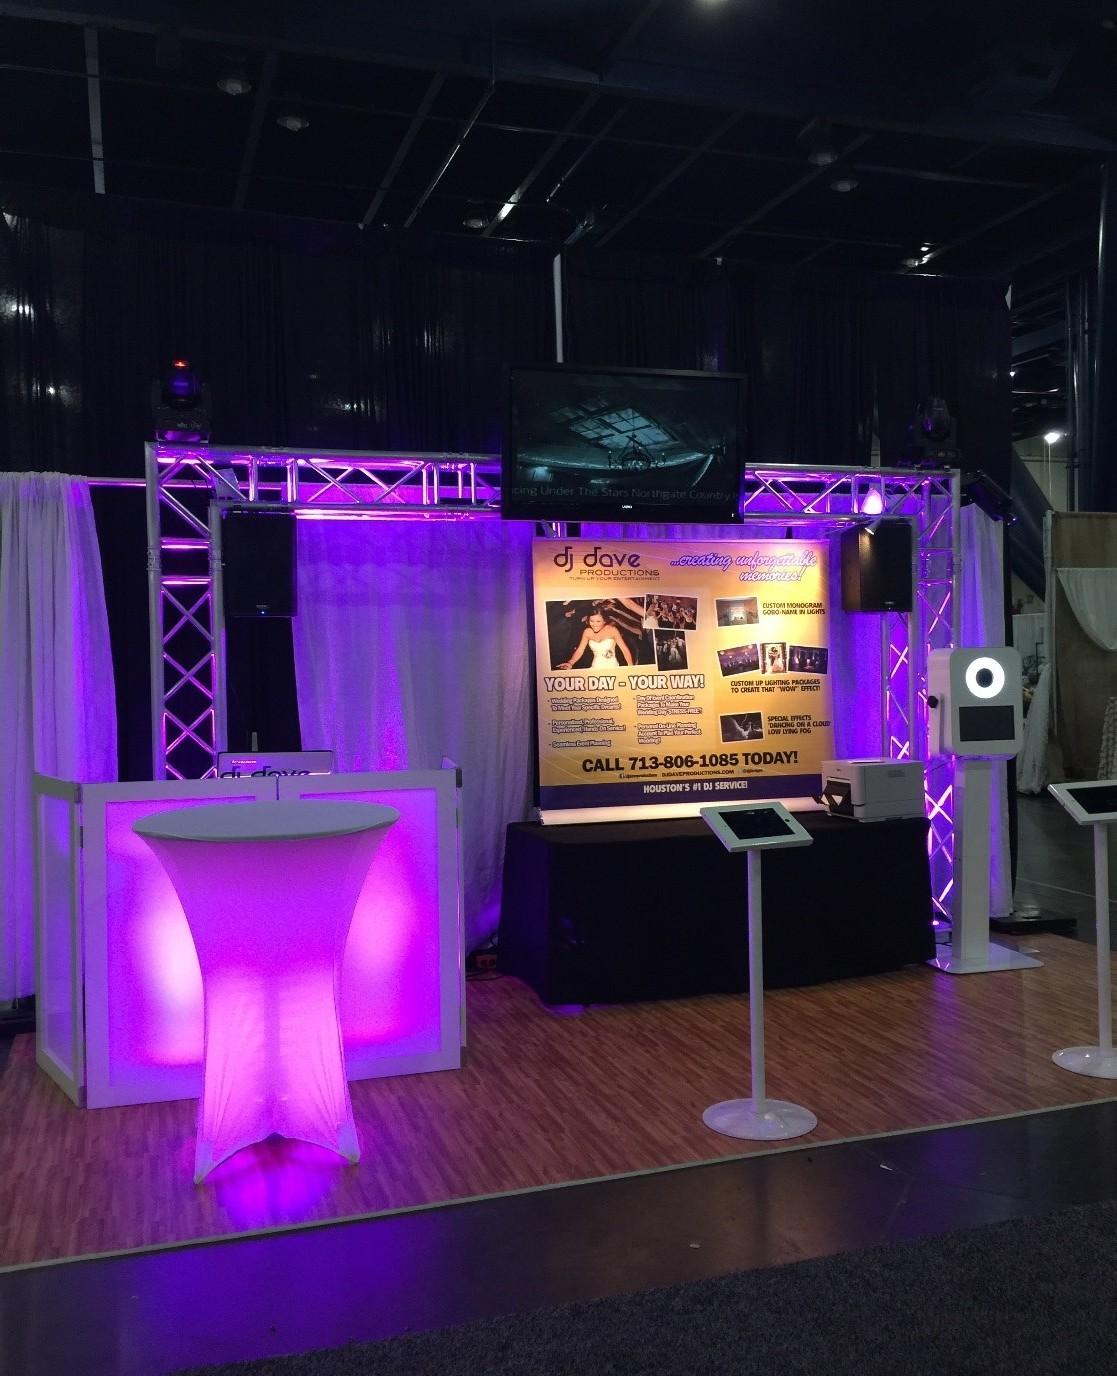 Houston's Best Wedding DJ Entertainment, DJ Dave Productions